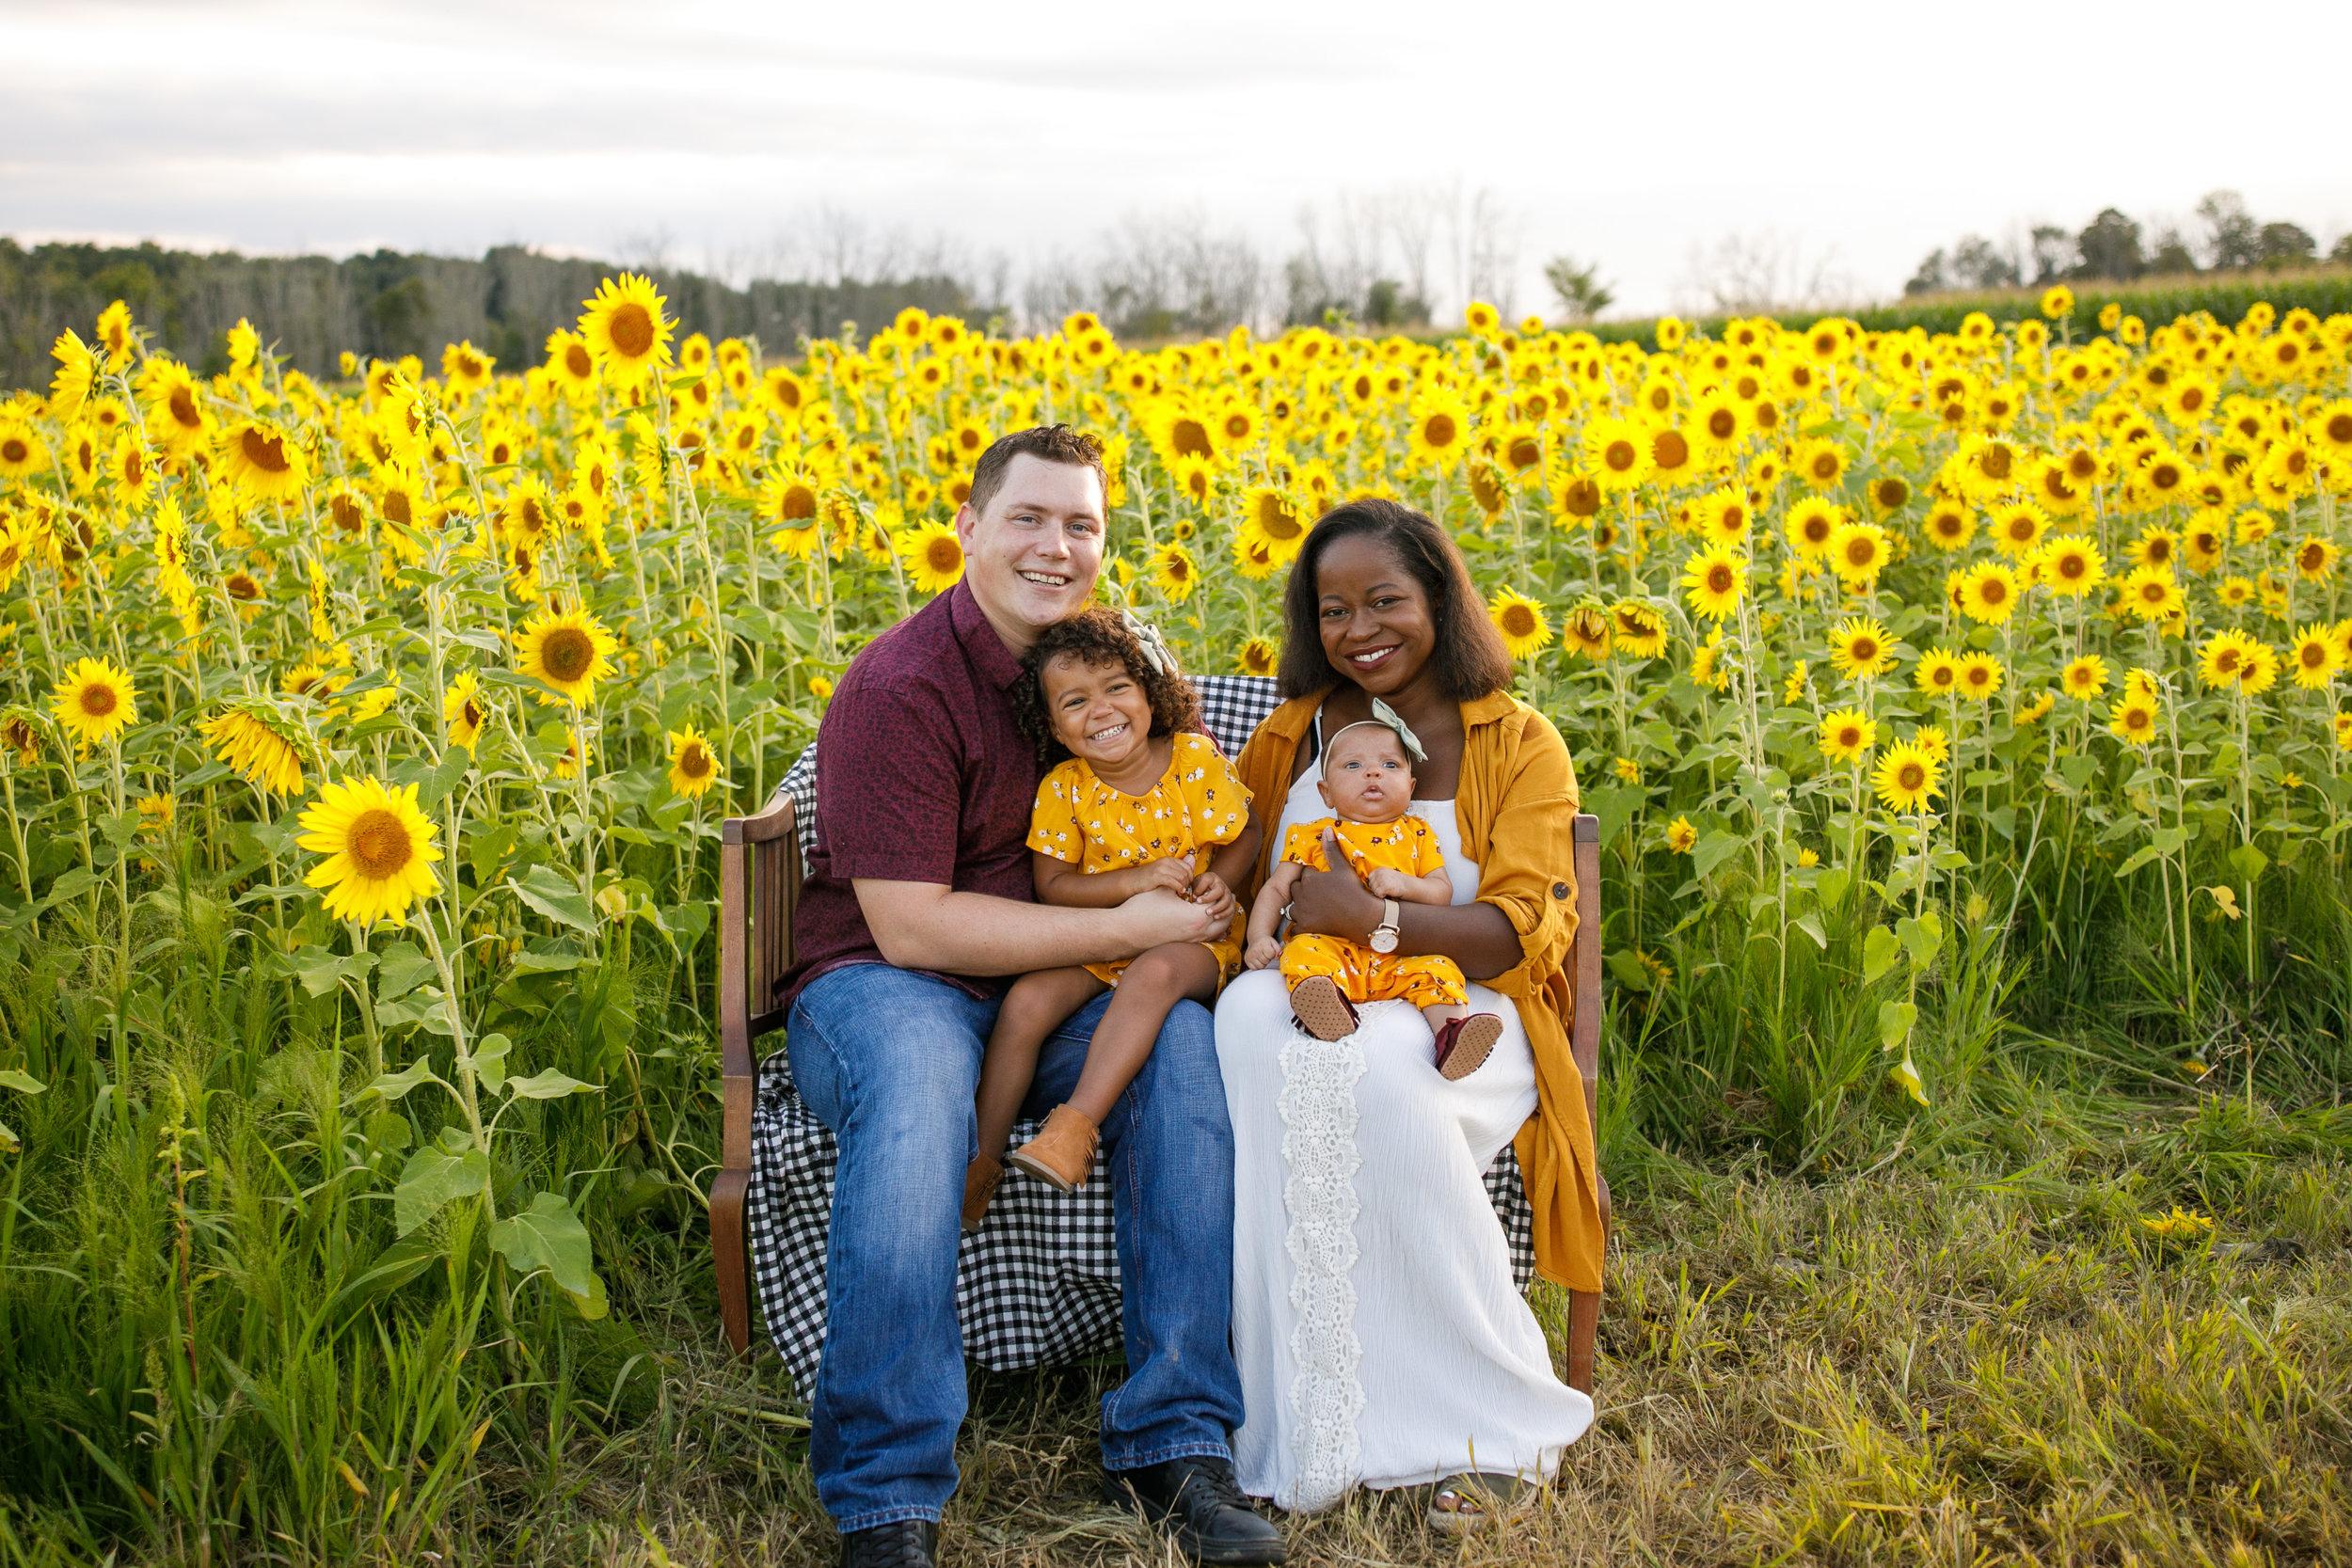 Morris Family Summer 2019 - Grand Rapids Photographer - Grand Rapids Family Photographer - Ed Dunneback and Girls - J Darling Photo 027.jpg